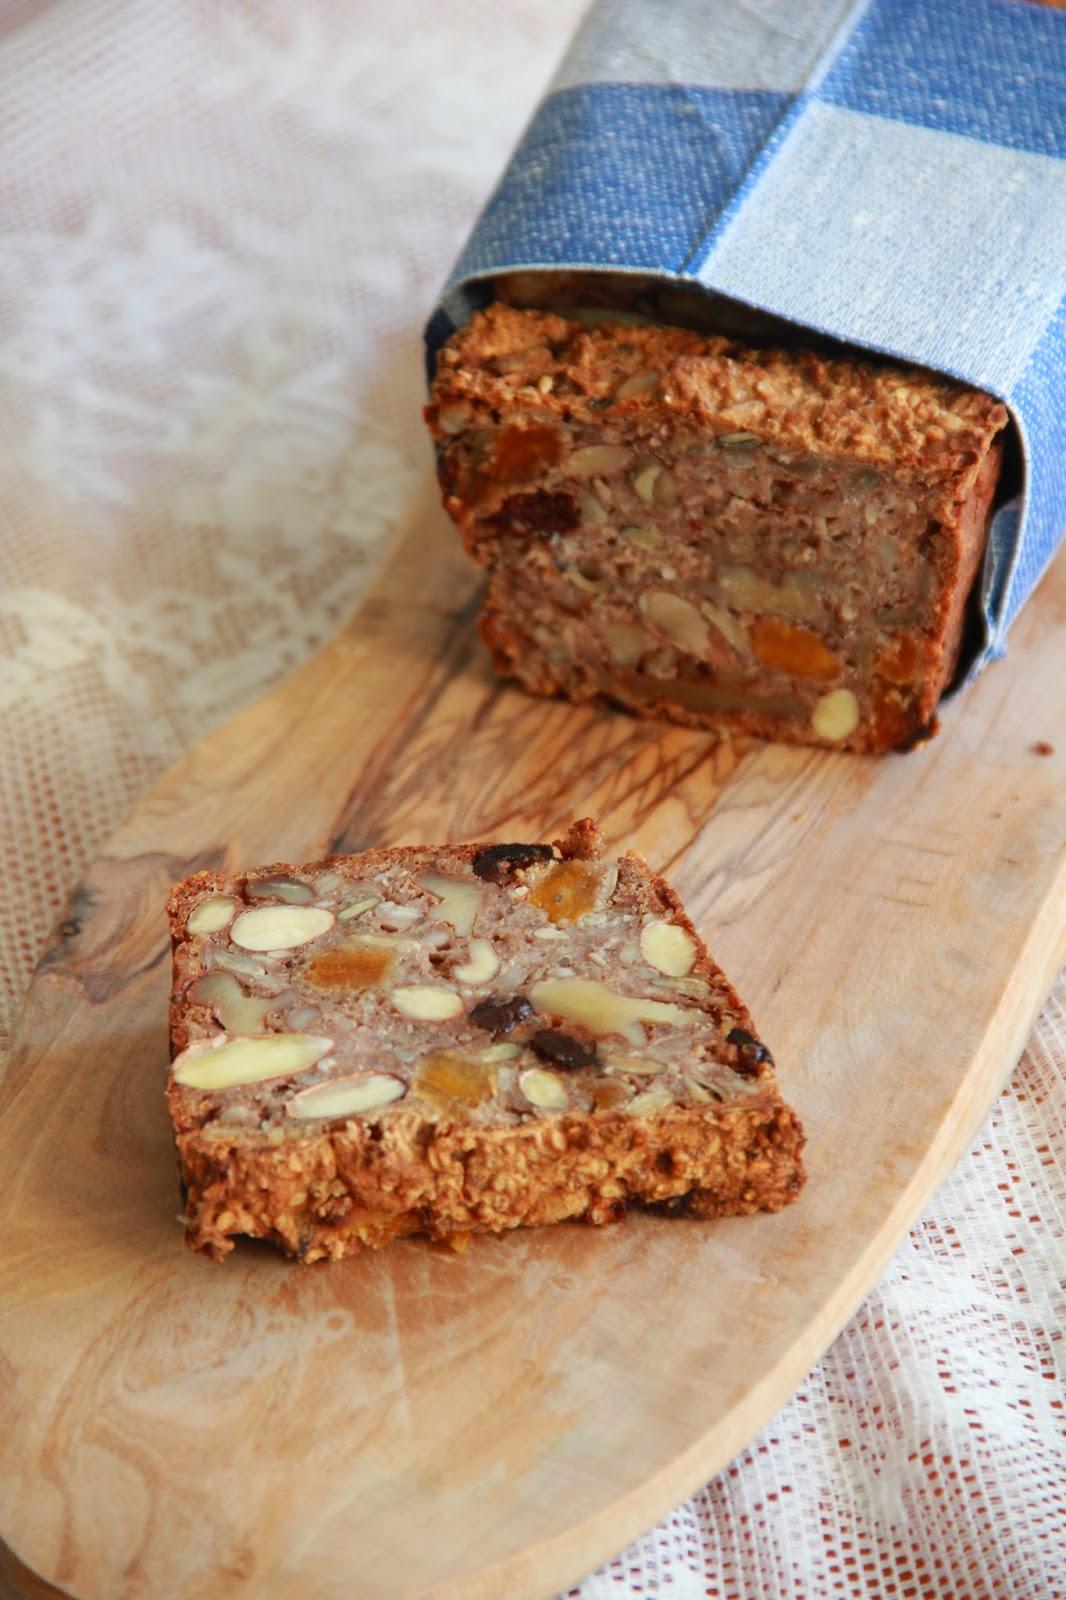 noten- en zadenbrood - www.desmaakvancecile.com